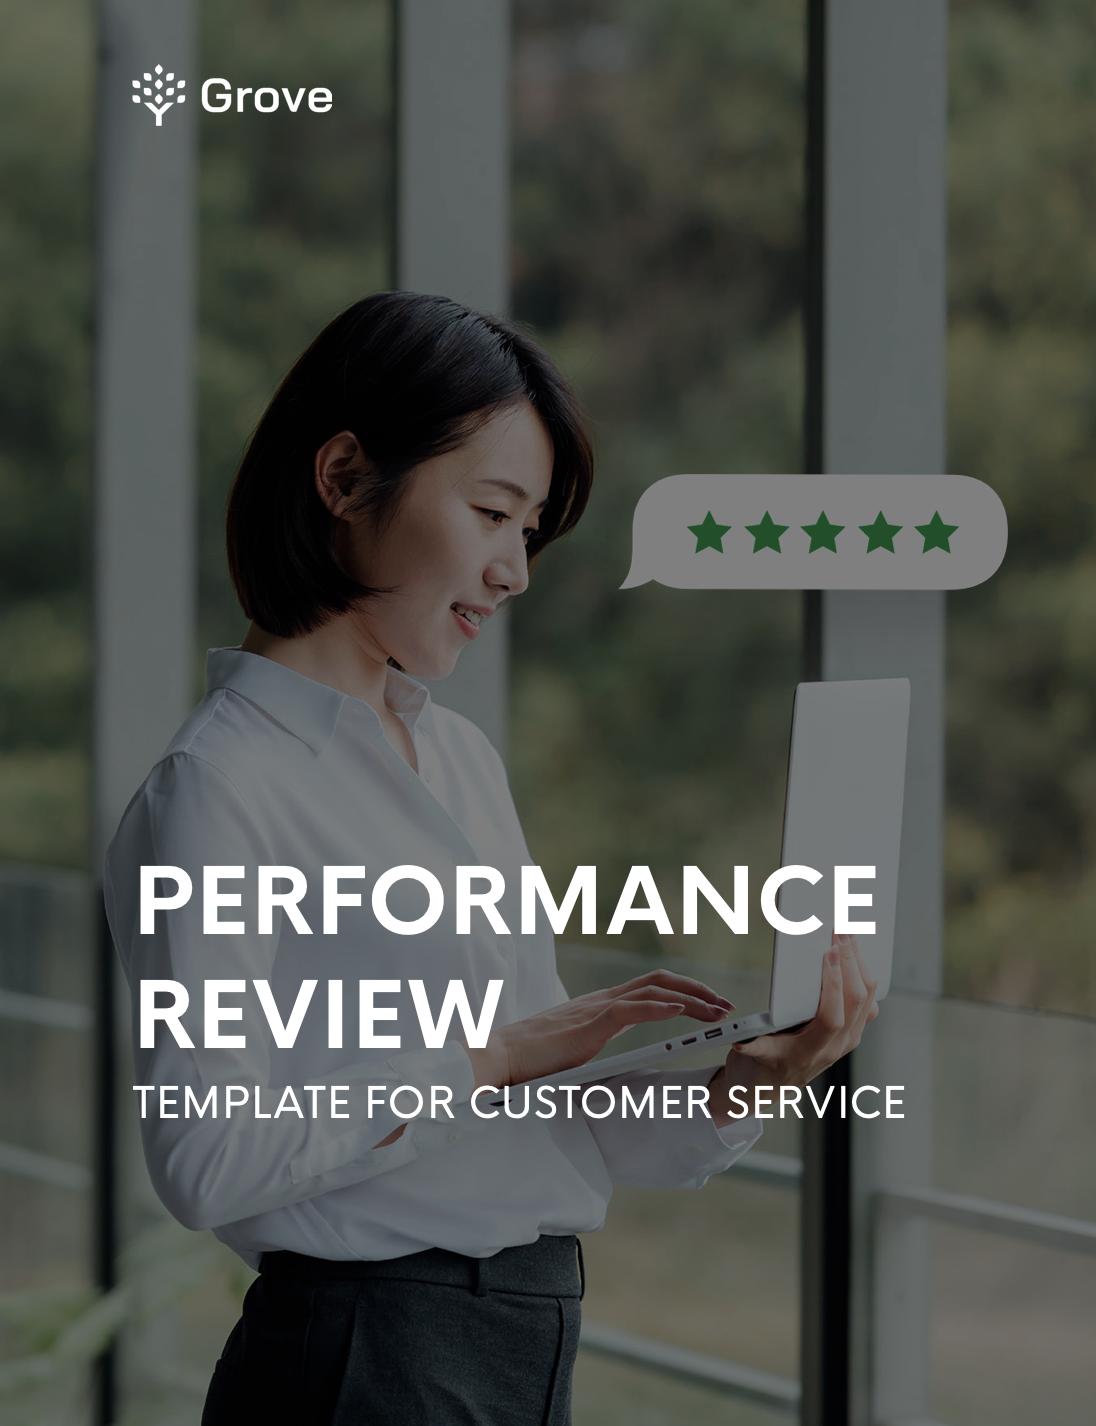 Grove HR - Customer service performance review template slider 1